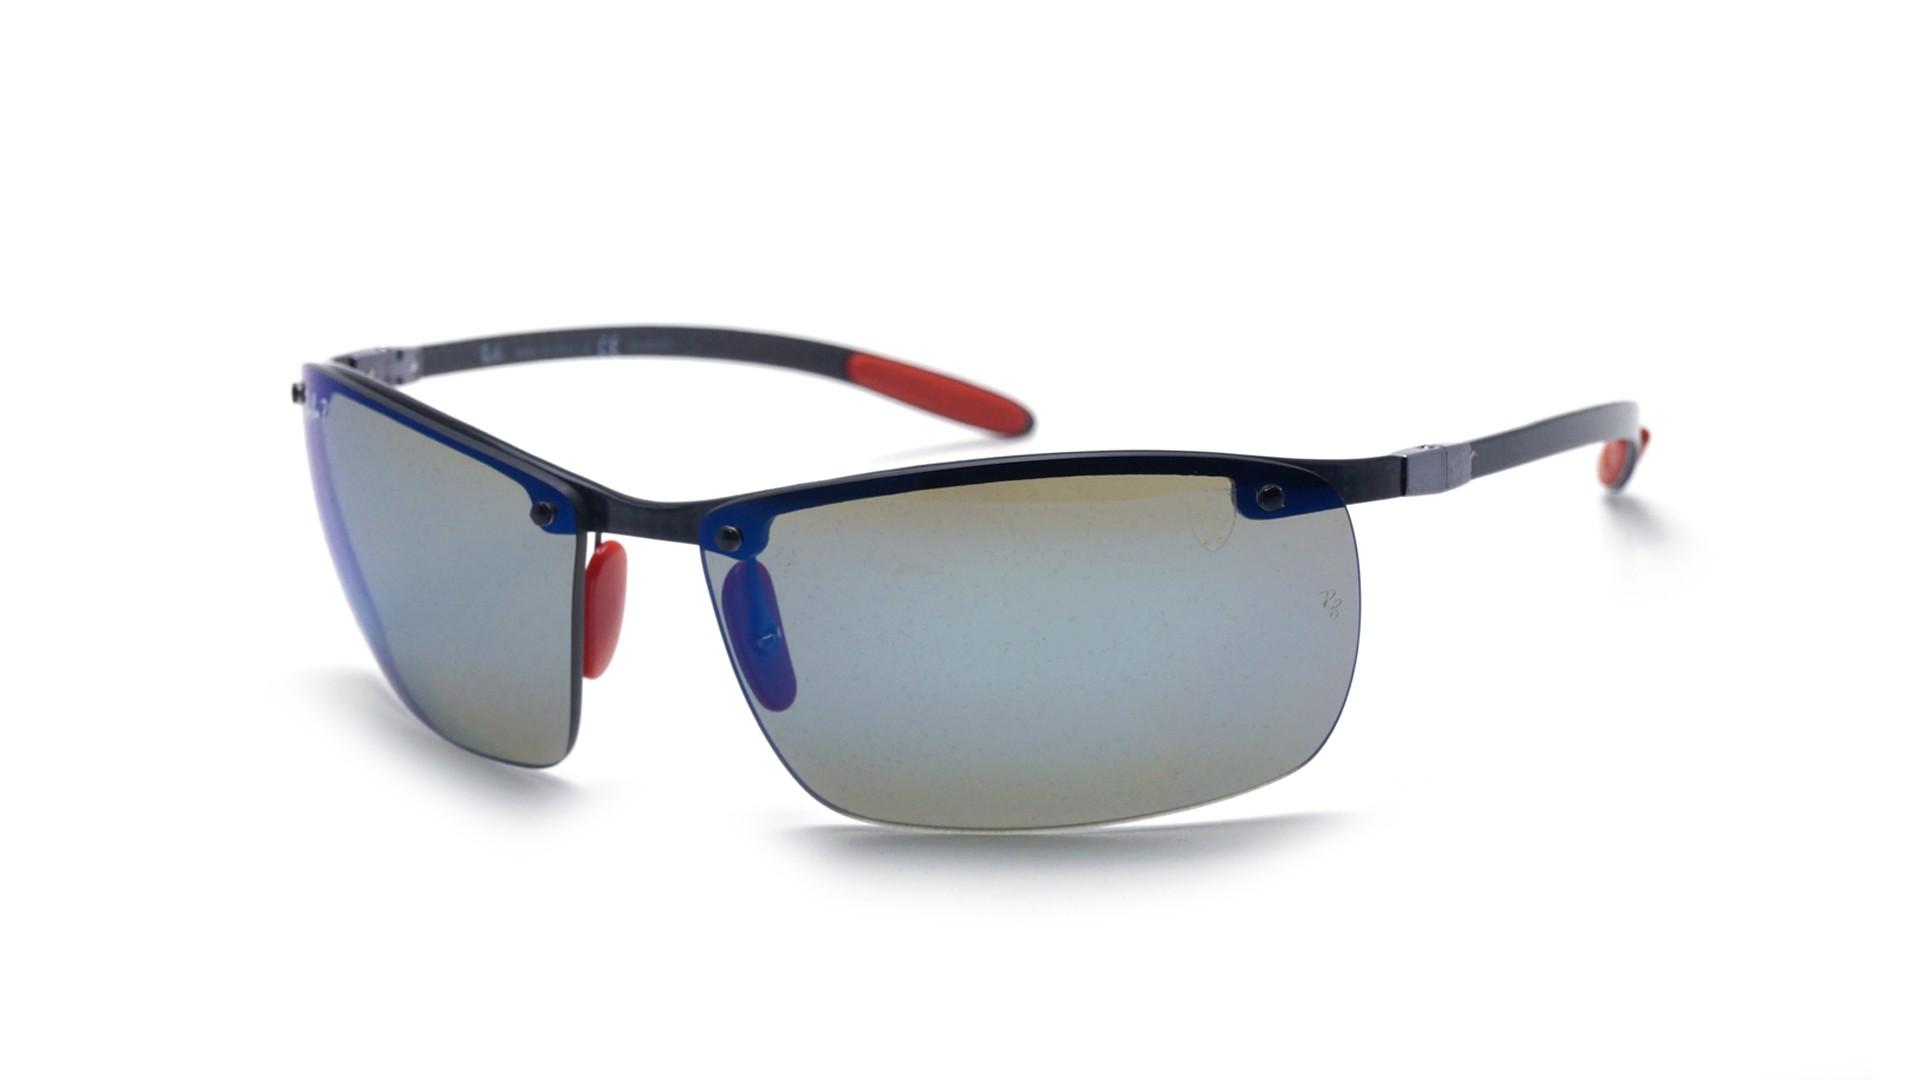 d3848b48fd Sunglasses Ray-Ban Fibre Carbon Scuderia Ferrari Grey RB8305M F005 H0 65-14  Large Polarized Flash